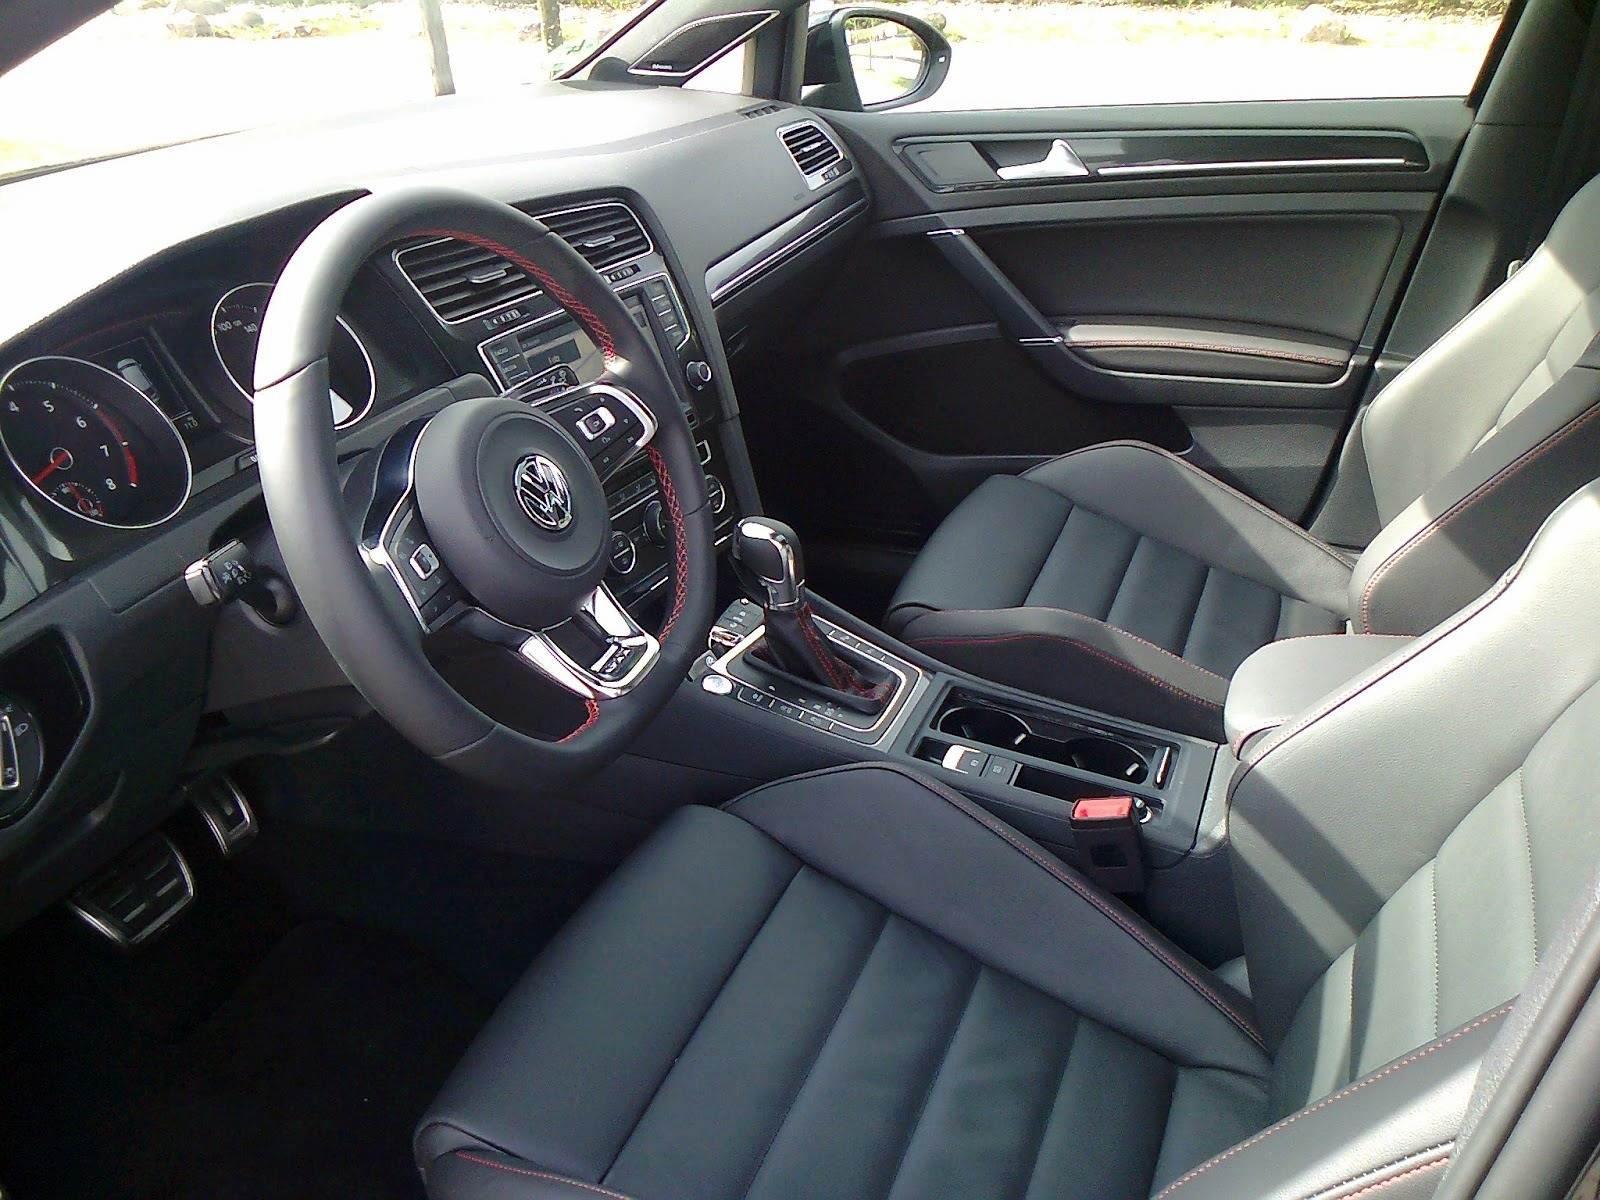 MINI Countryman x Golf GTI 2014